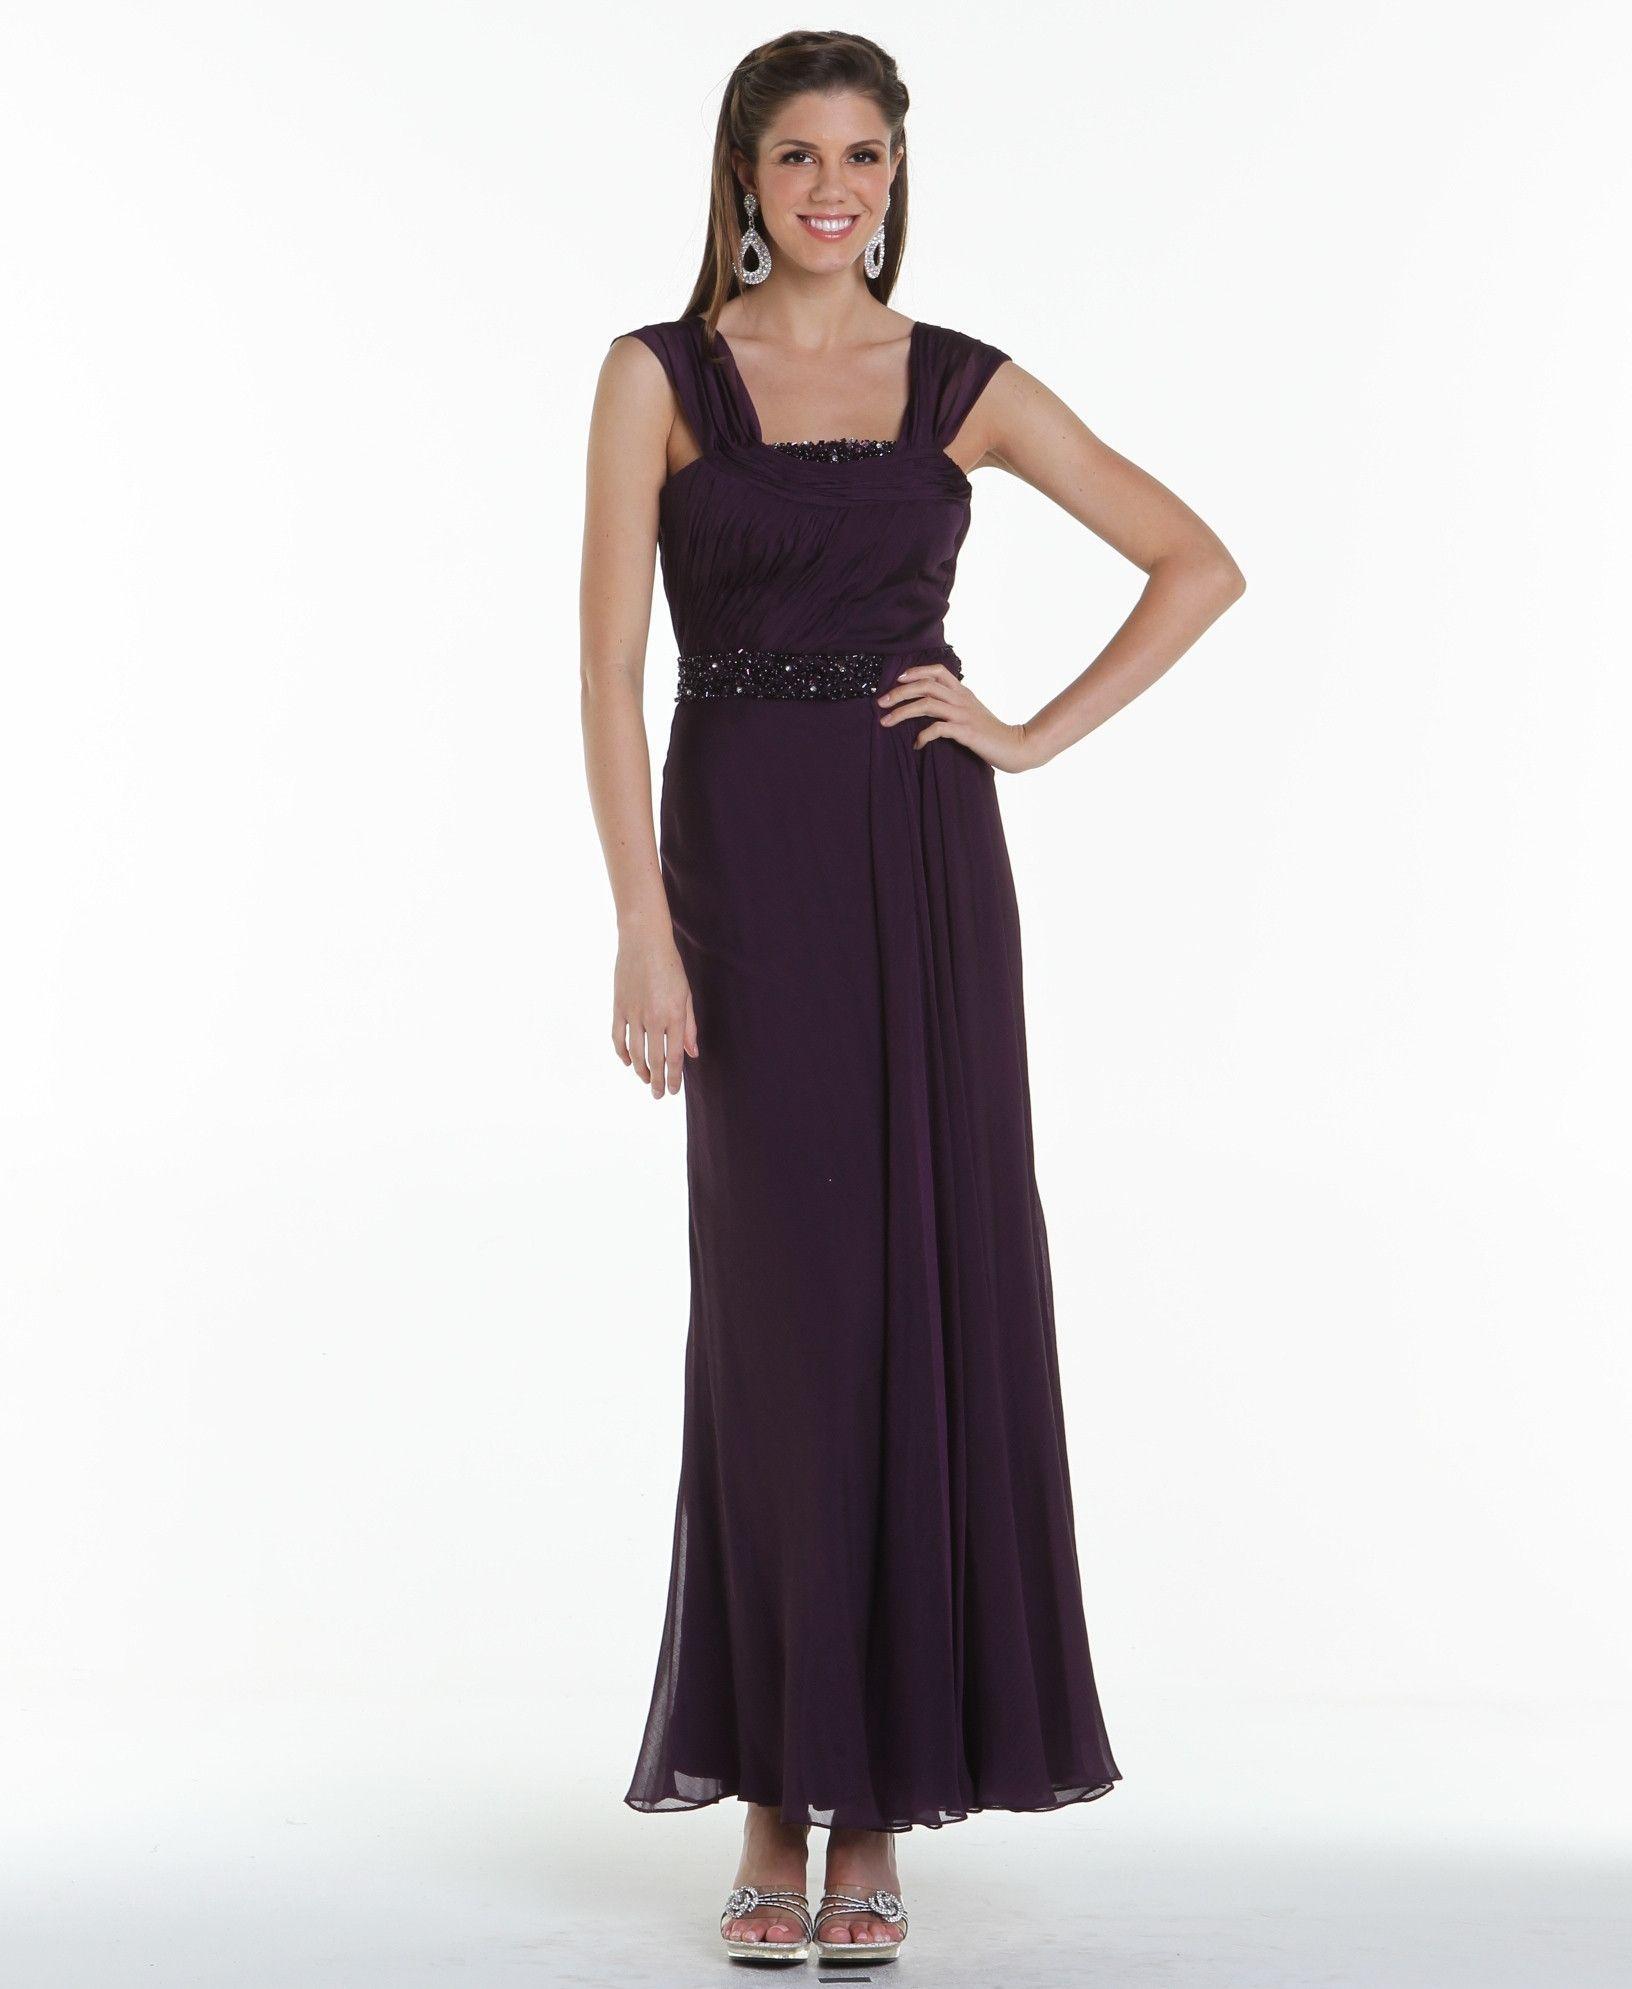 Modest Elegant Long Mother of the Bride Dress Eggplant